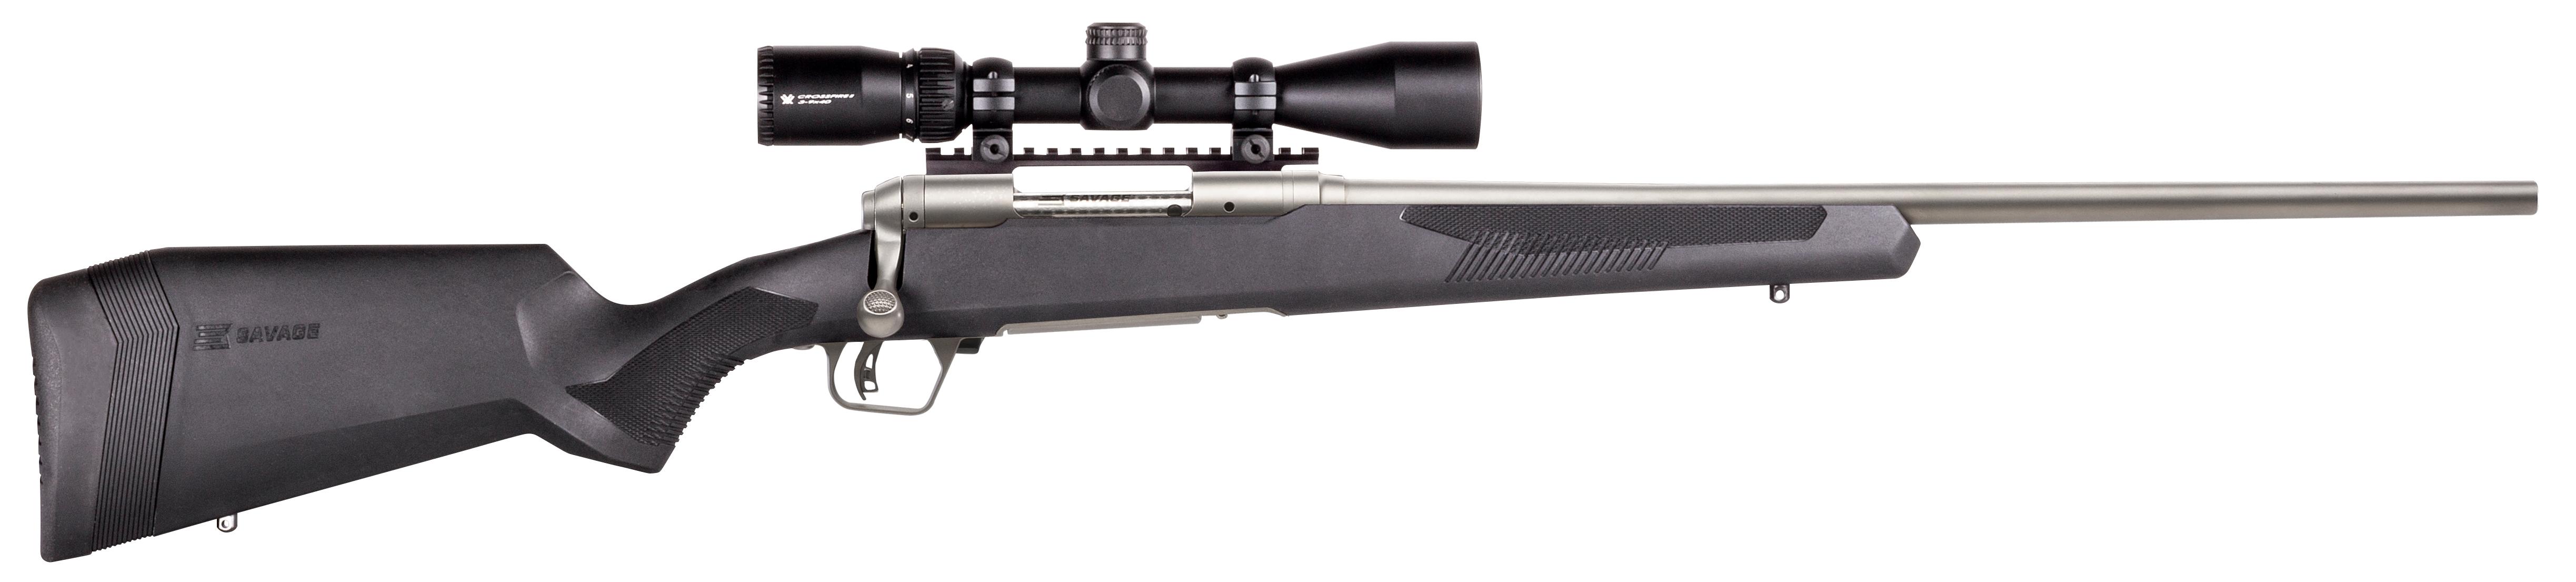 Savage Arms 110 Apex Storm XP 7mm-08